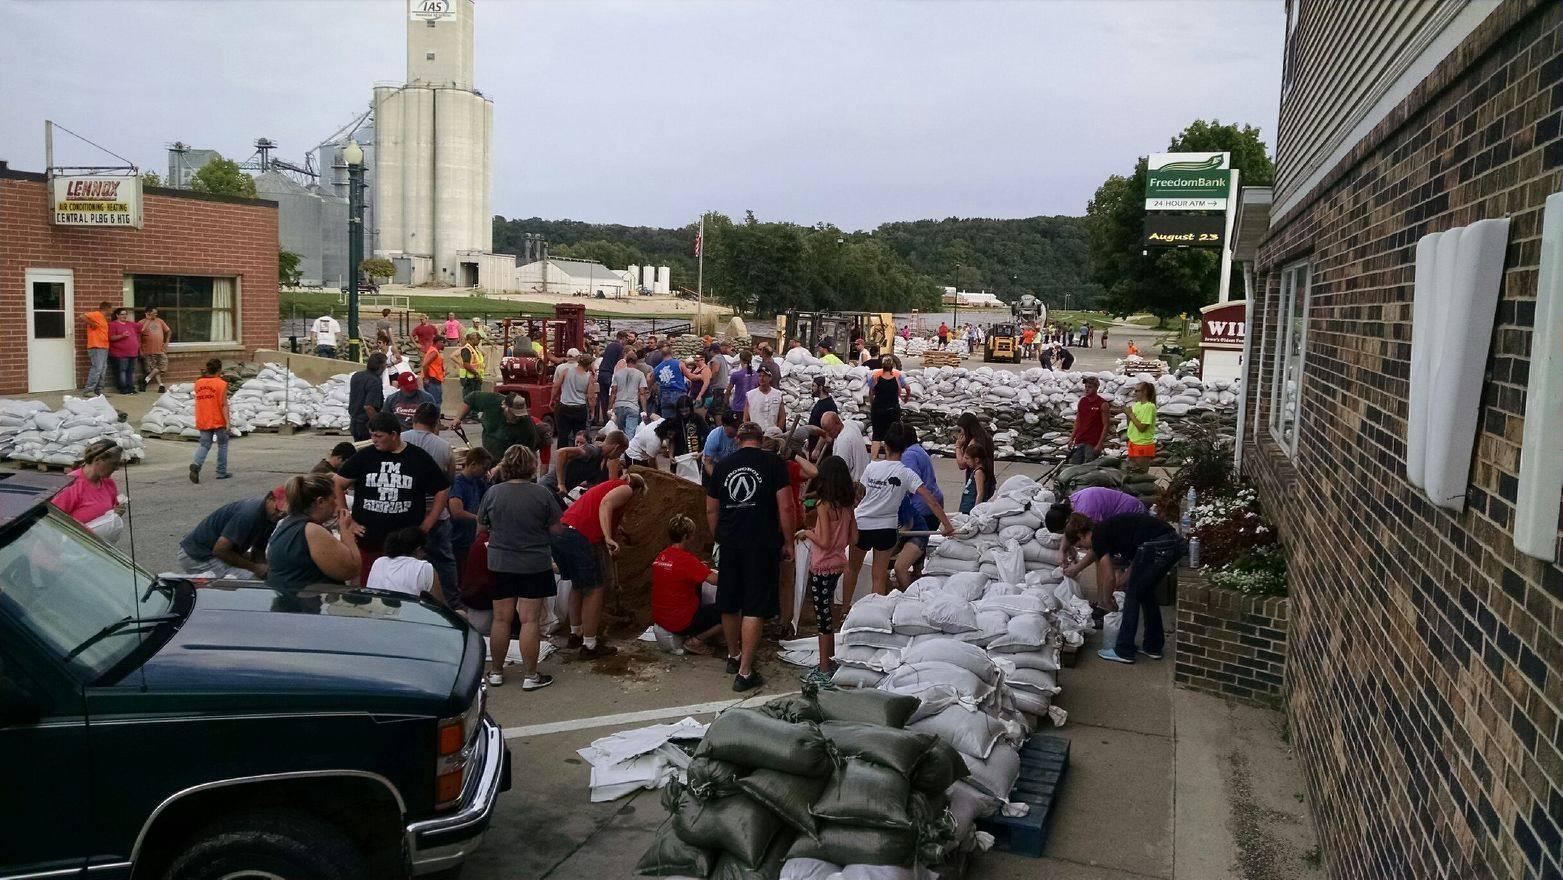 Elkader, Iowa residents build a sandbag wall to prevent flooding.